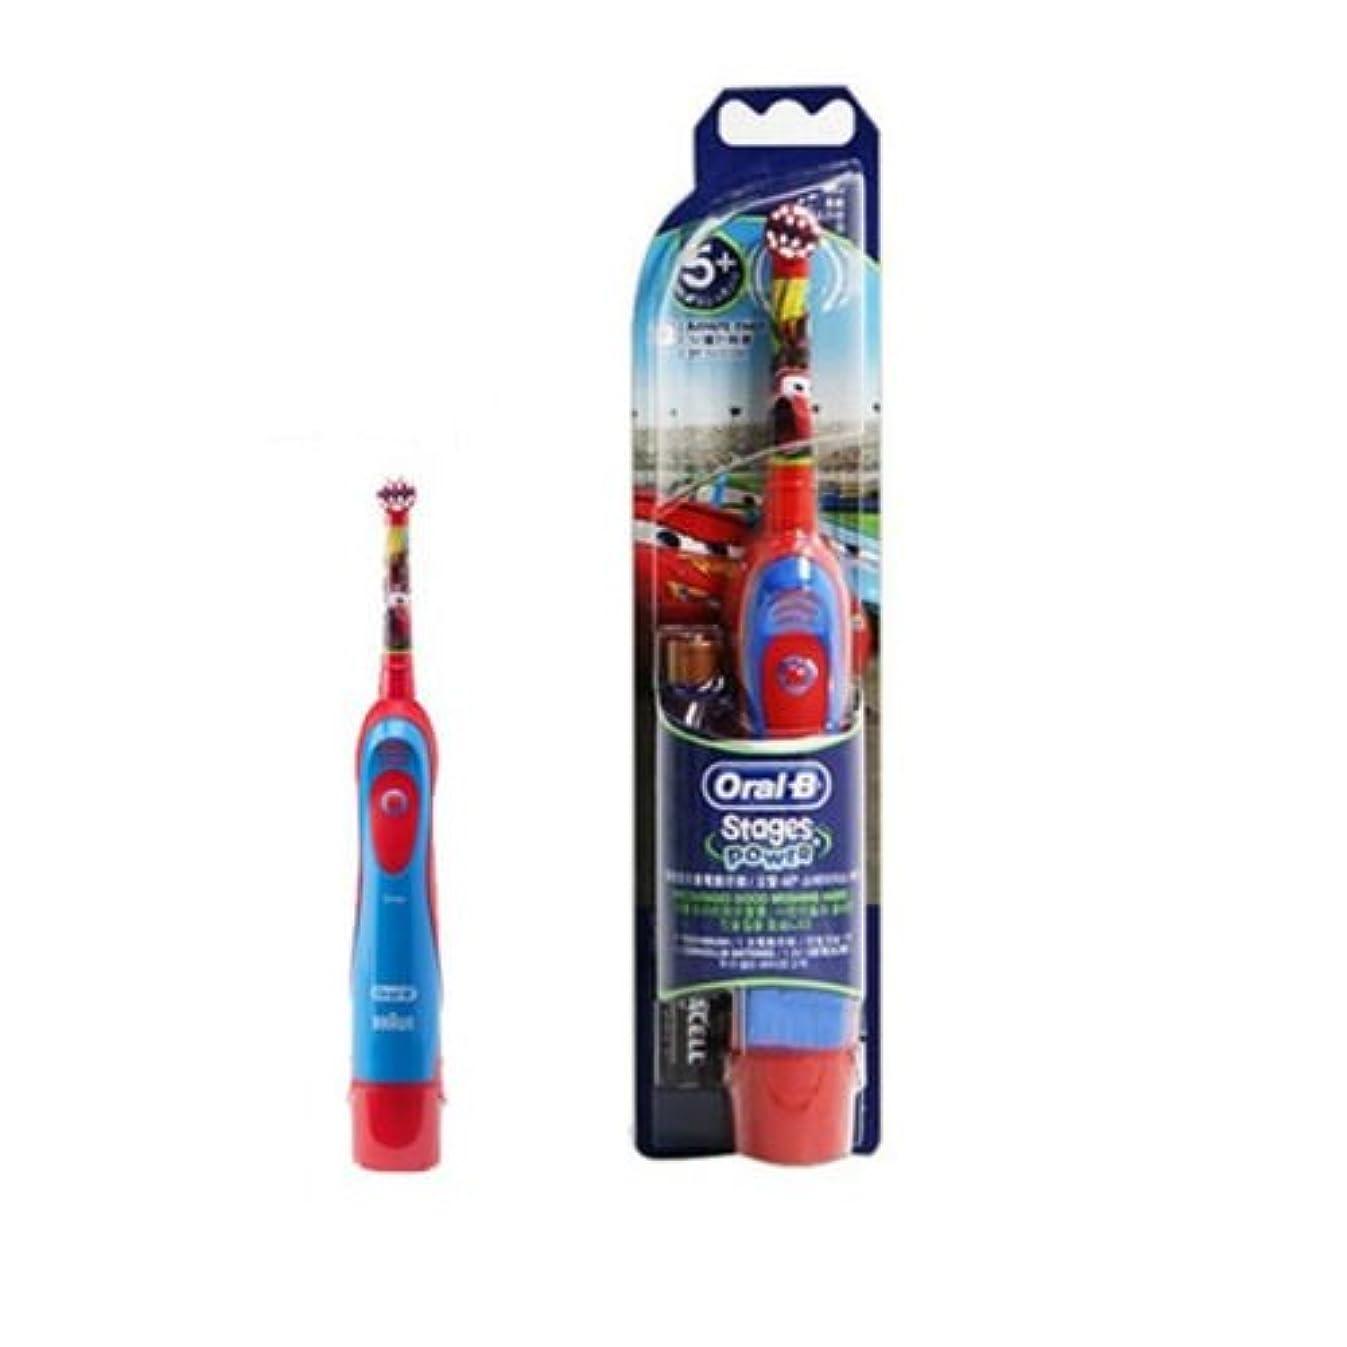 遠い熱意電極Braun Oral-B D2 D2010 Disney Car Kids 電動歯ブラシ [並行輸入品]